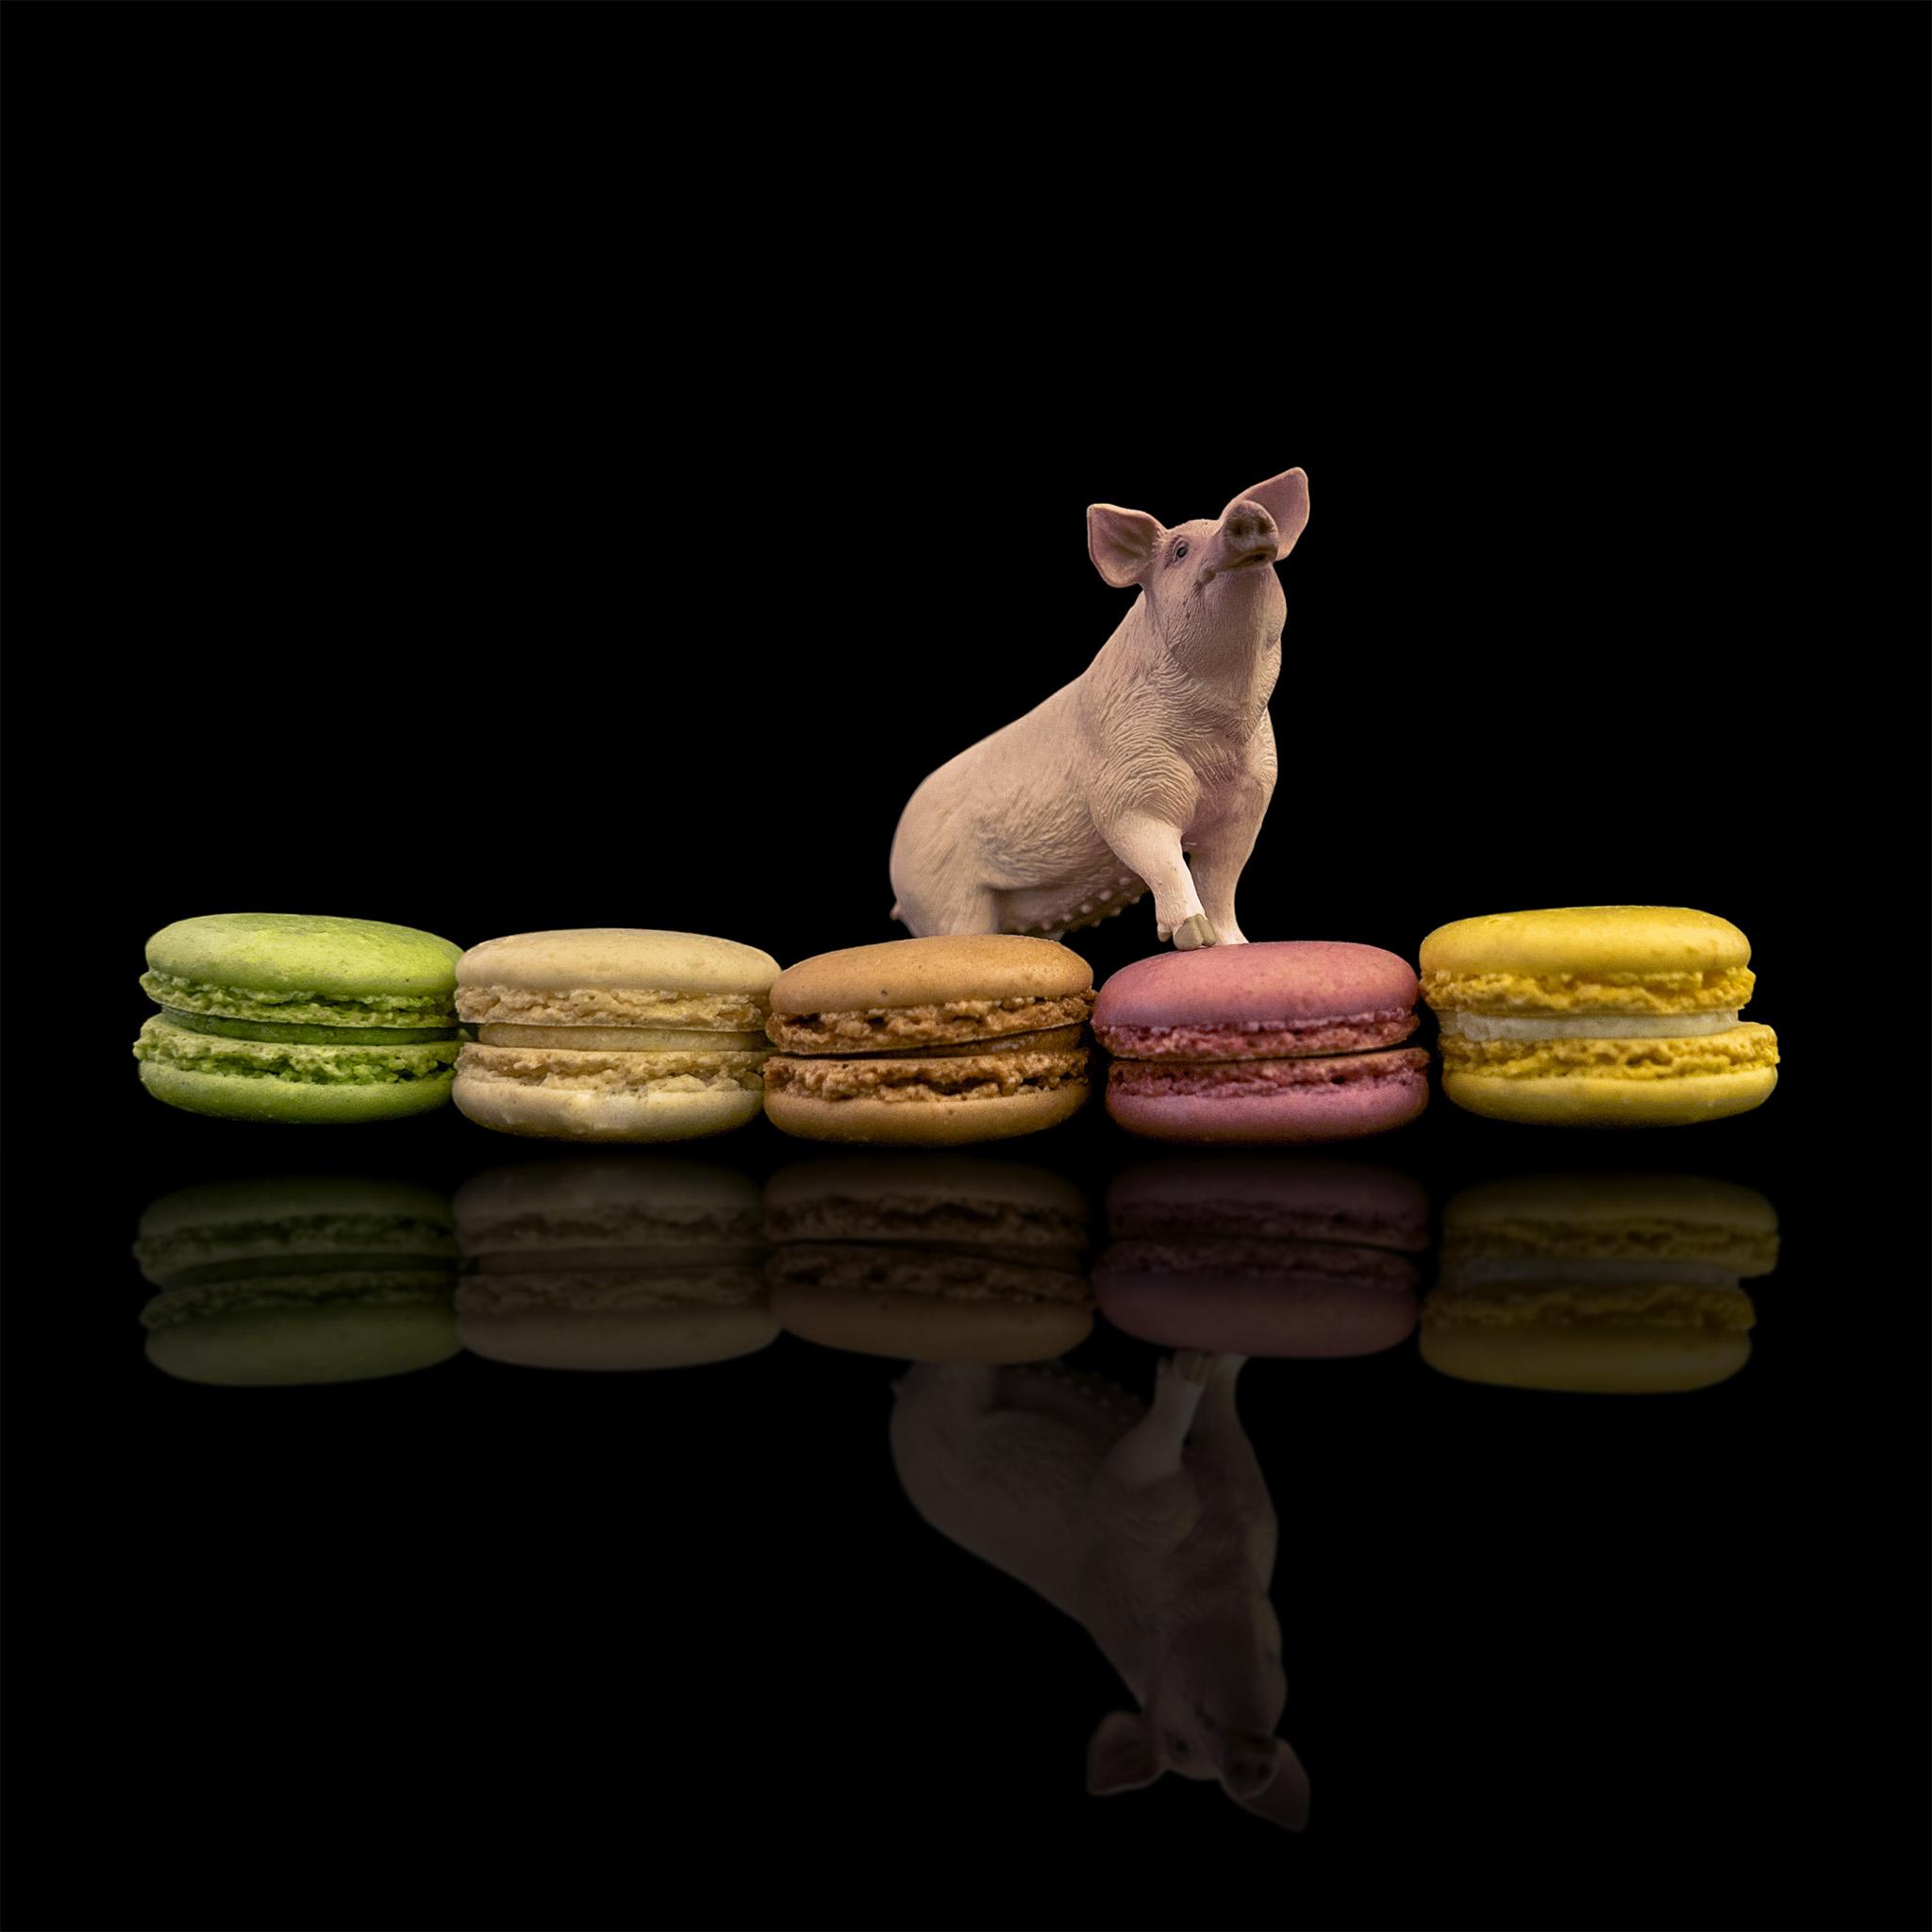 Melinda Isachsen JANIS Photography & Fine Art Pig & Macarons